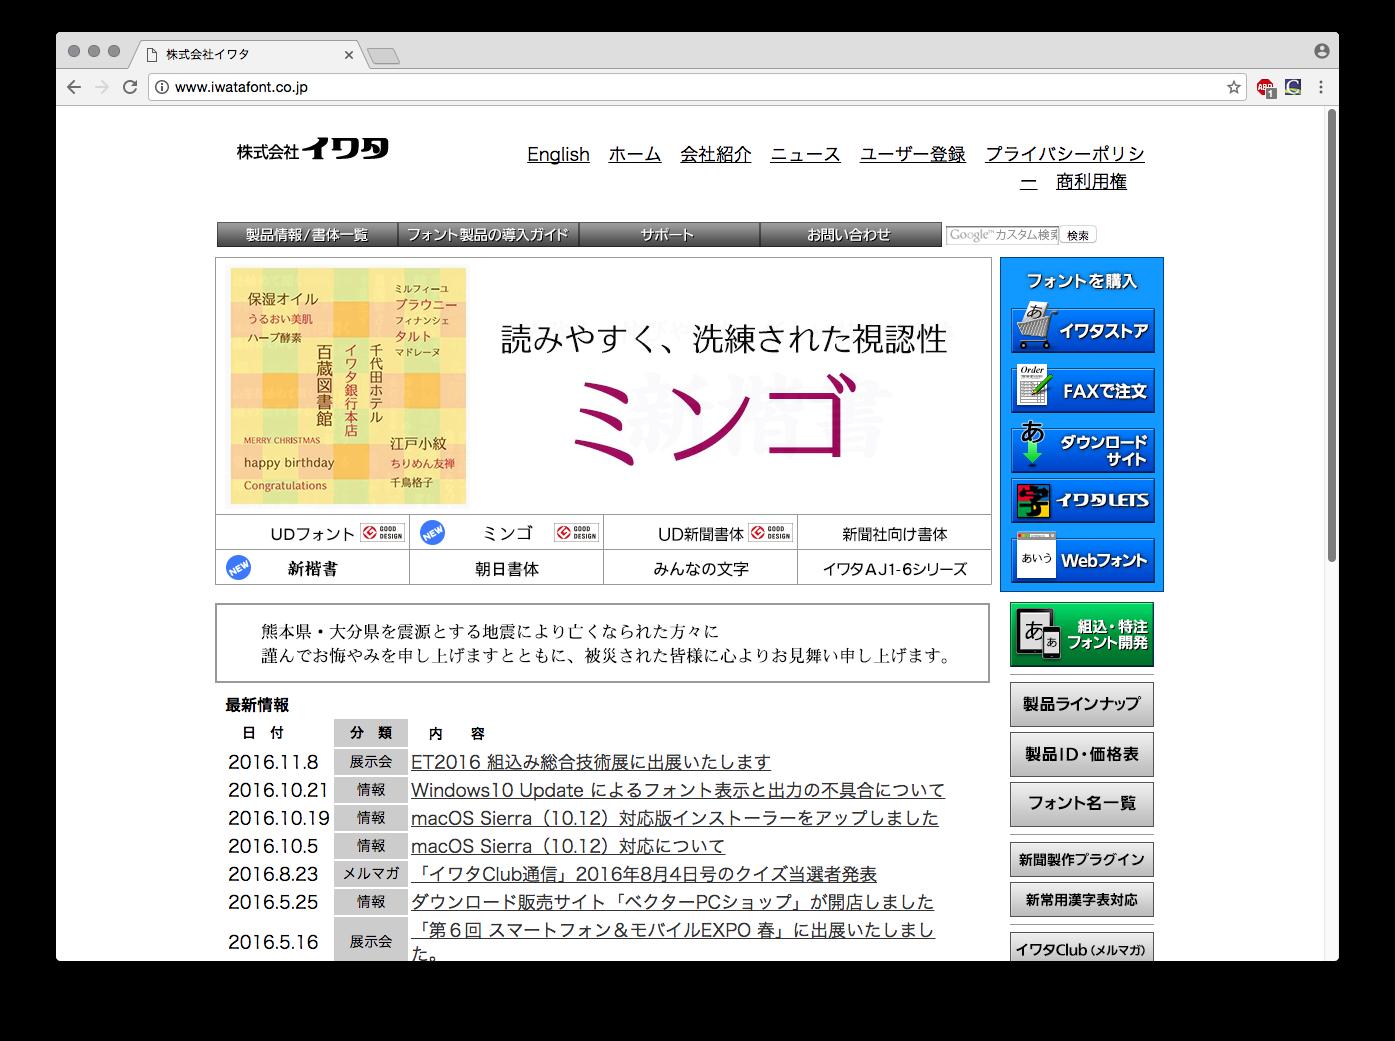 http://www.iwatafont.co.jp